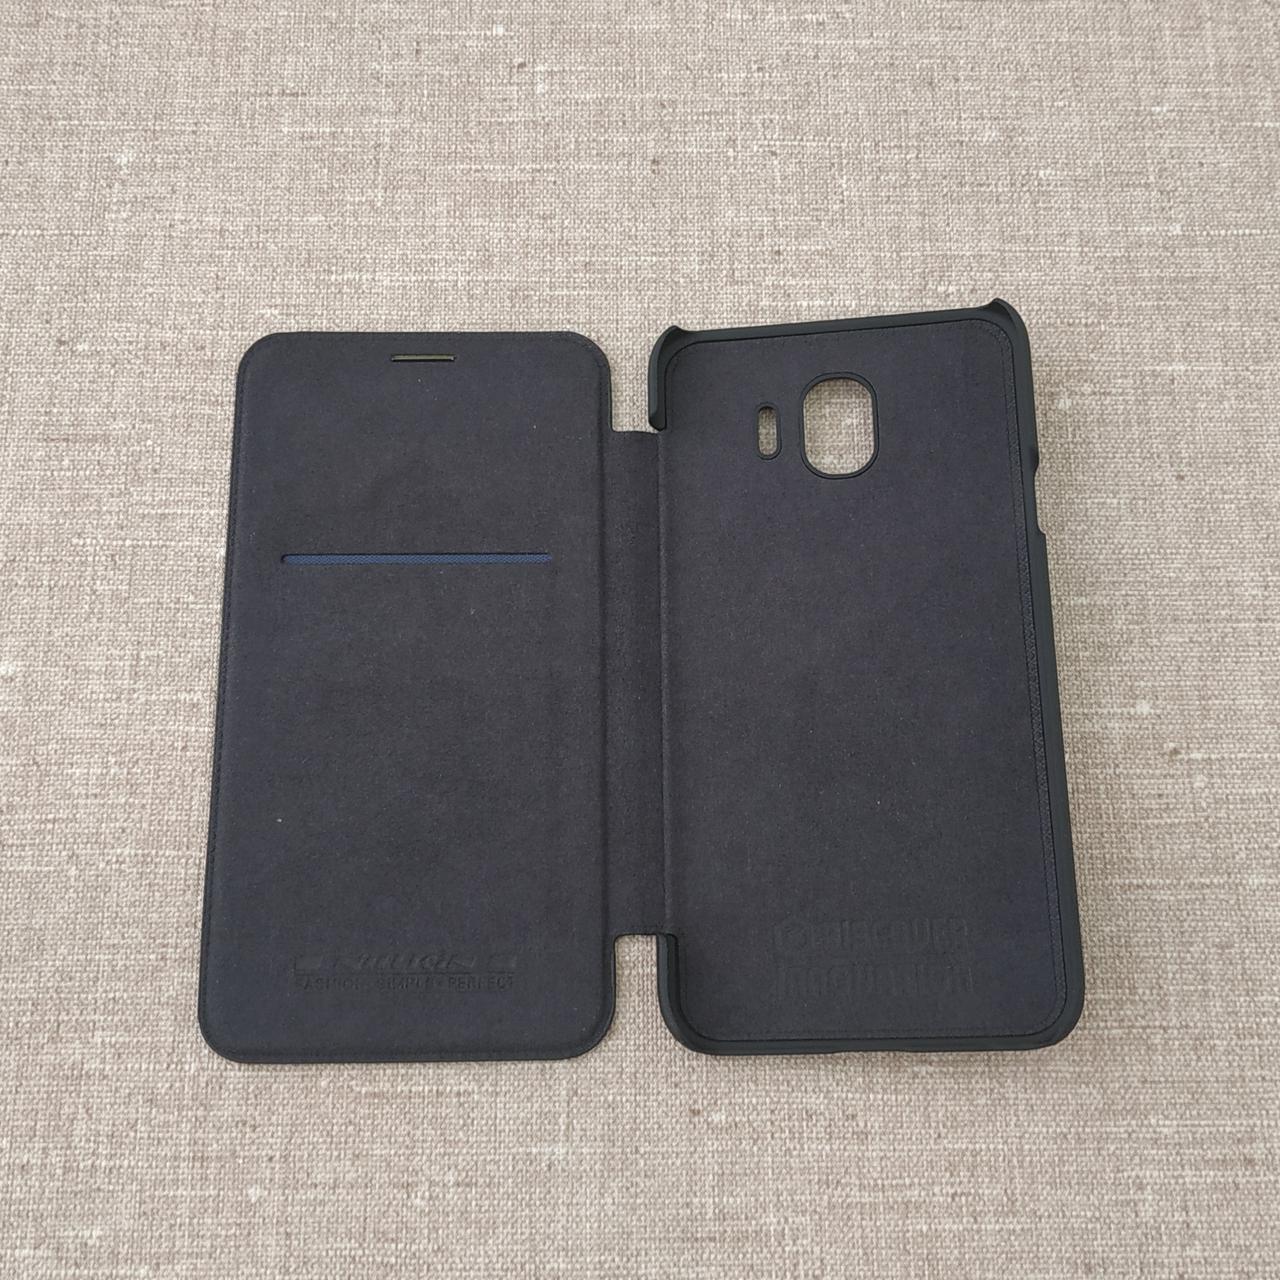 Чехол Nillkin Qin Samsung Galaxy J4 J400 black (J400) 2018